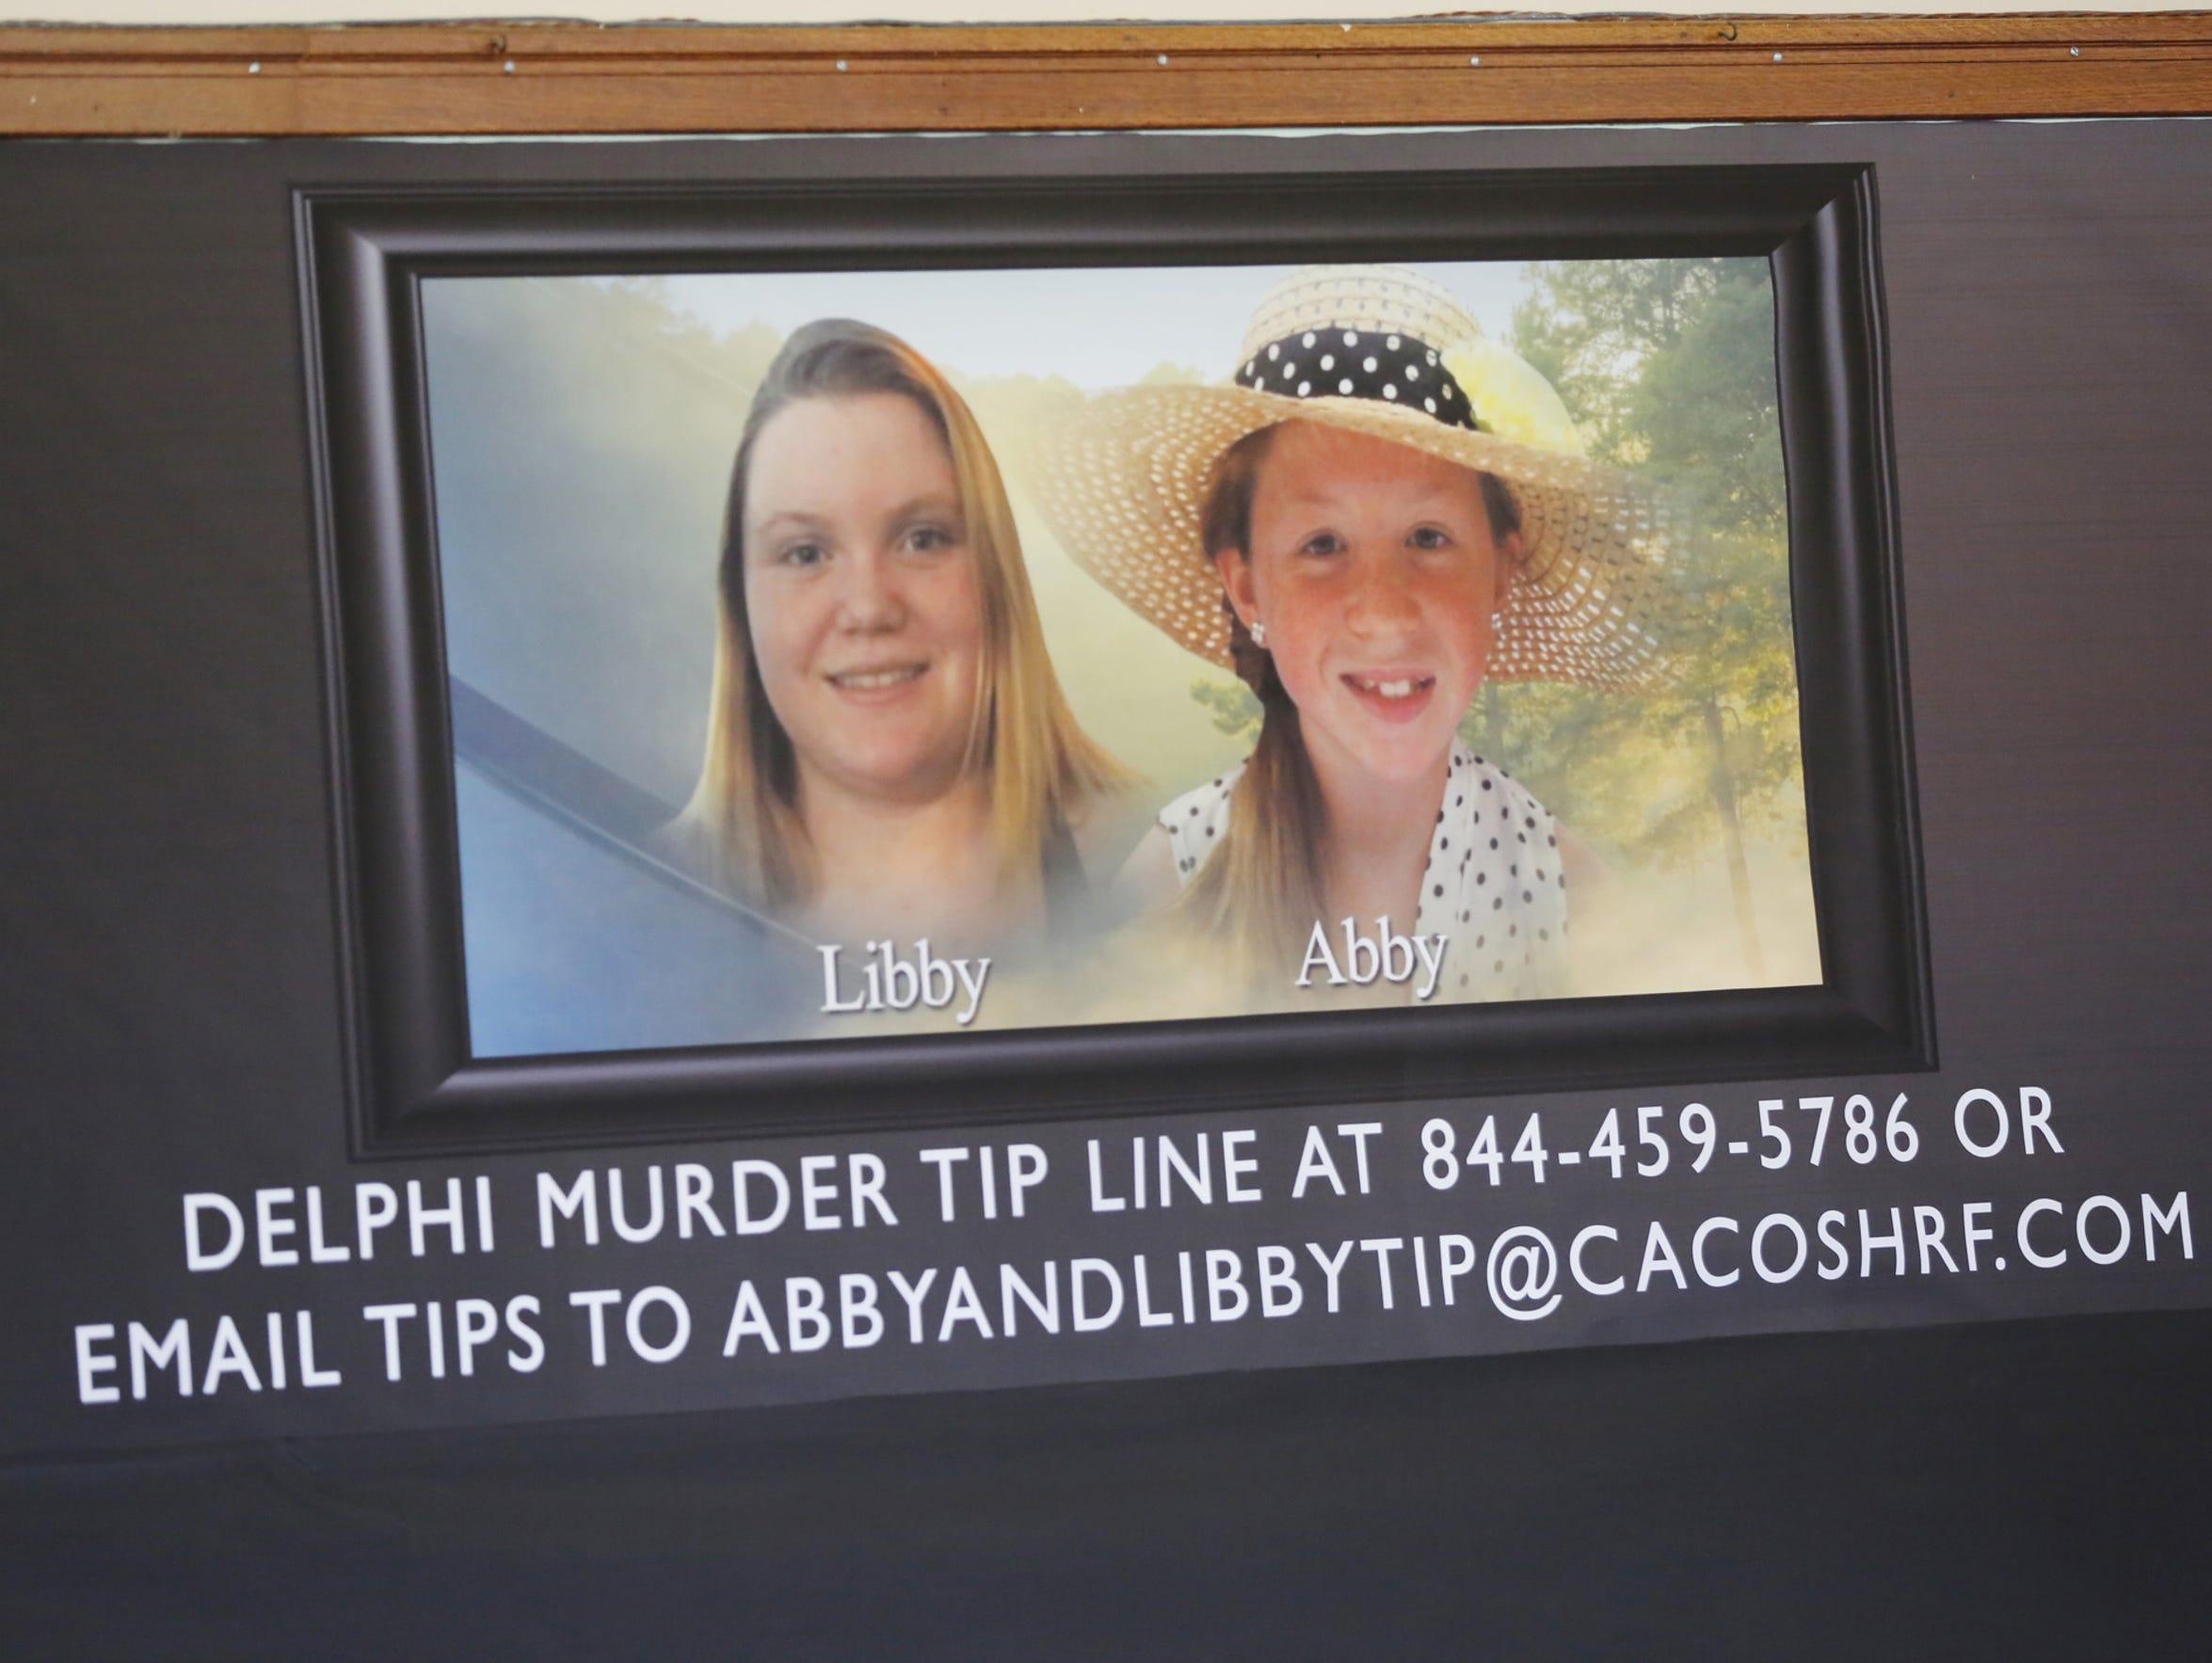 Posters of slain Delphi teens Liberty German and Abigail